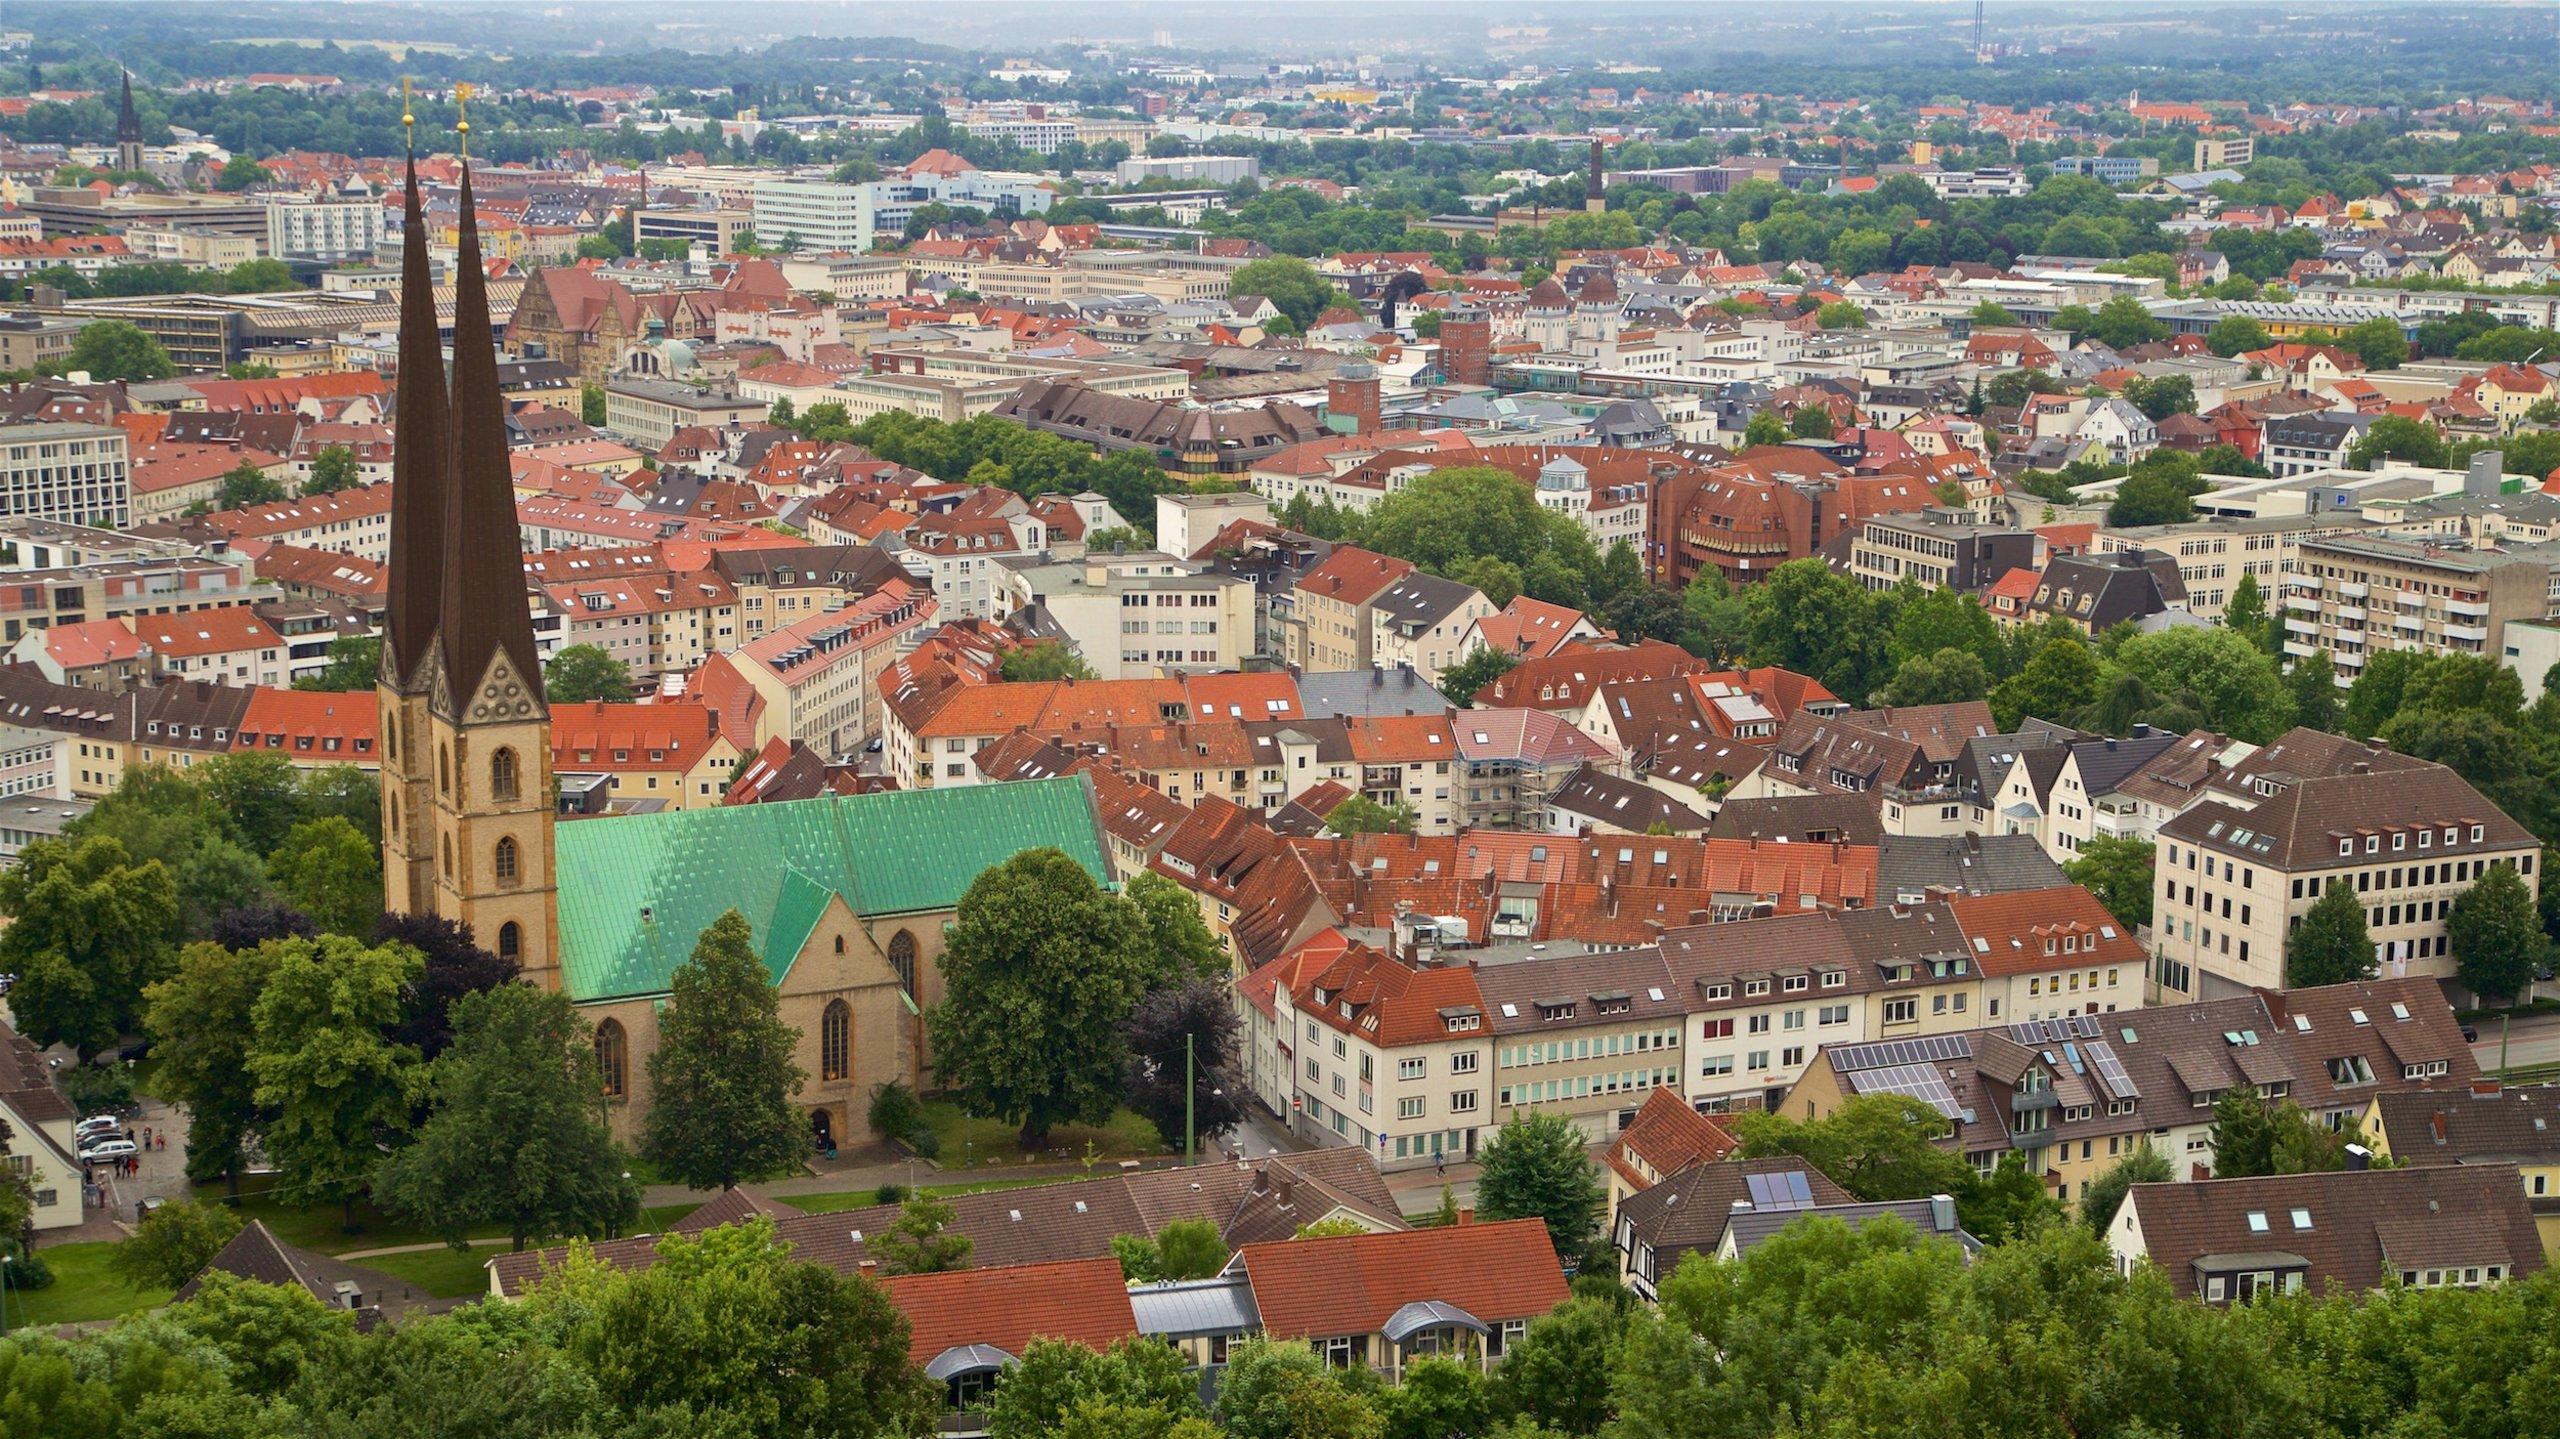 Bielefeld, North Rhine-Westphalia, Germany